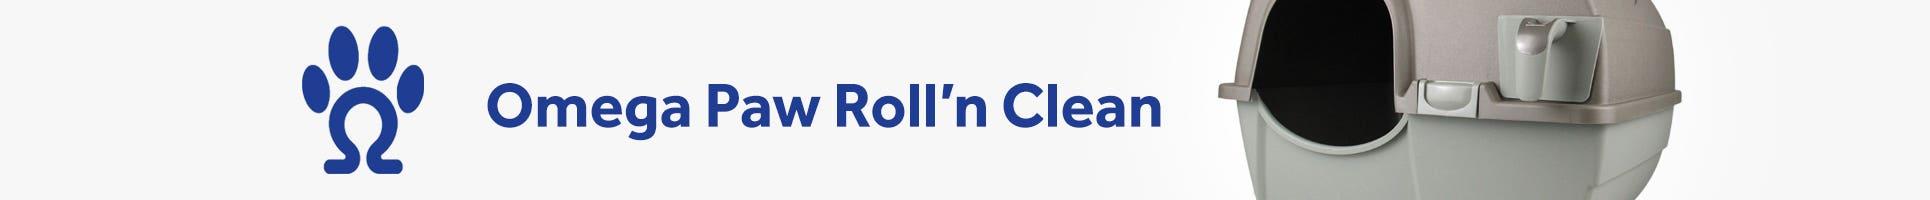 Omega Paw Roll'n Clean Litter Box